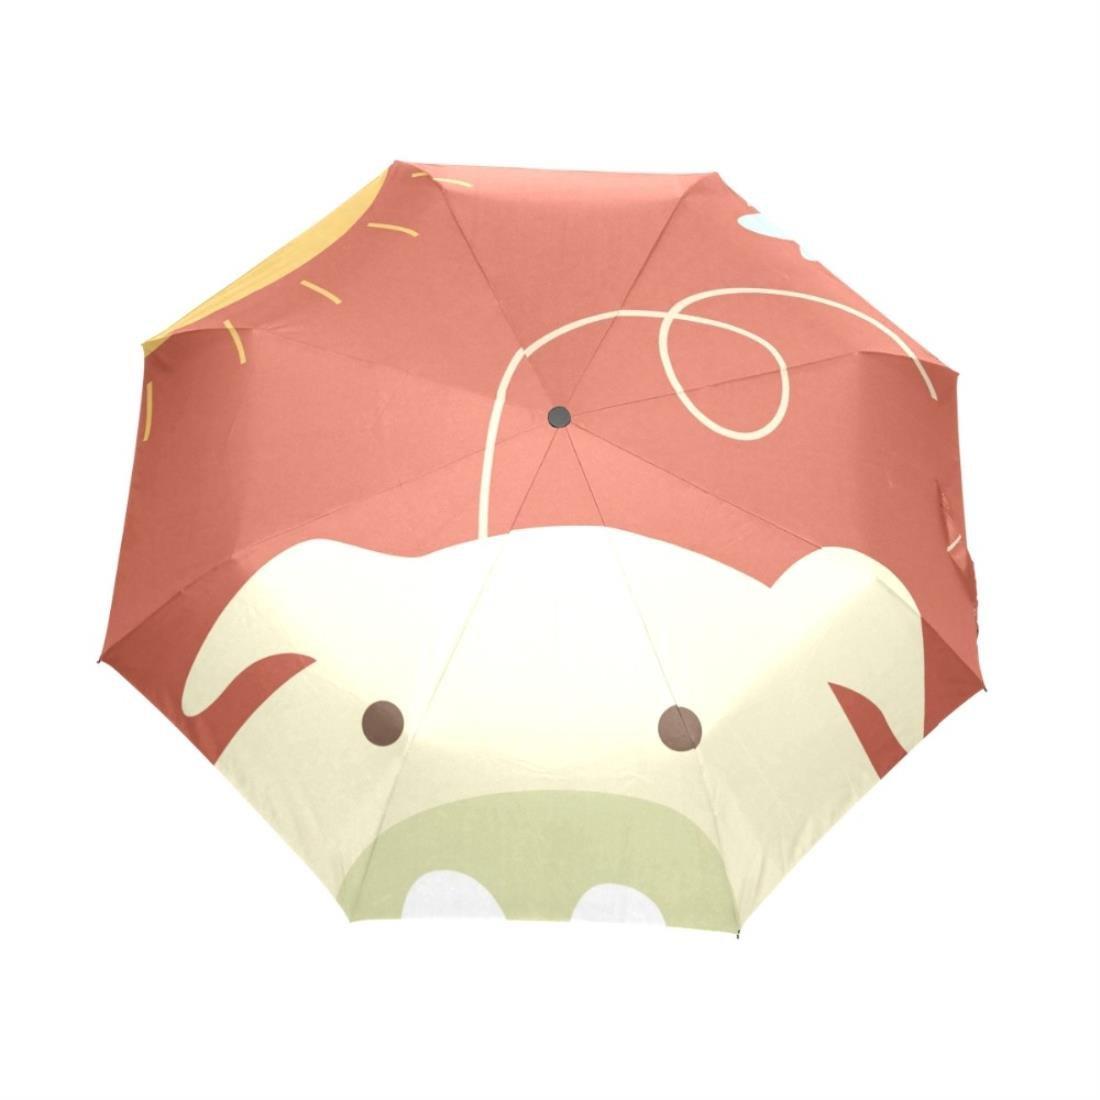 Guarda chuvas promocionais logotipo personalizado impresso